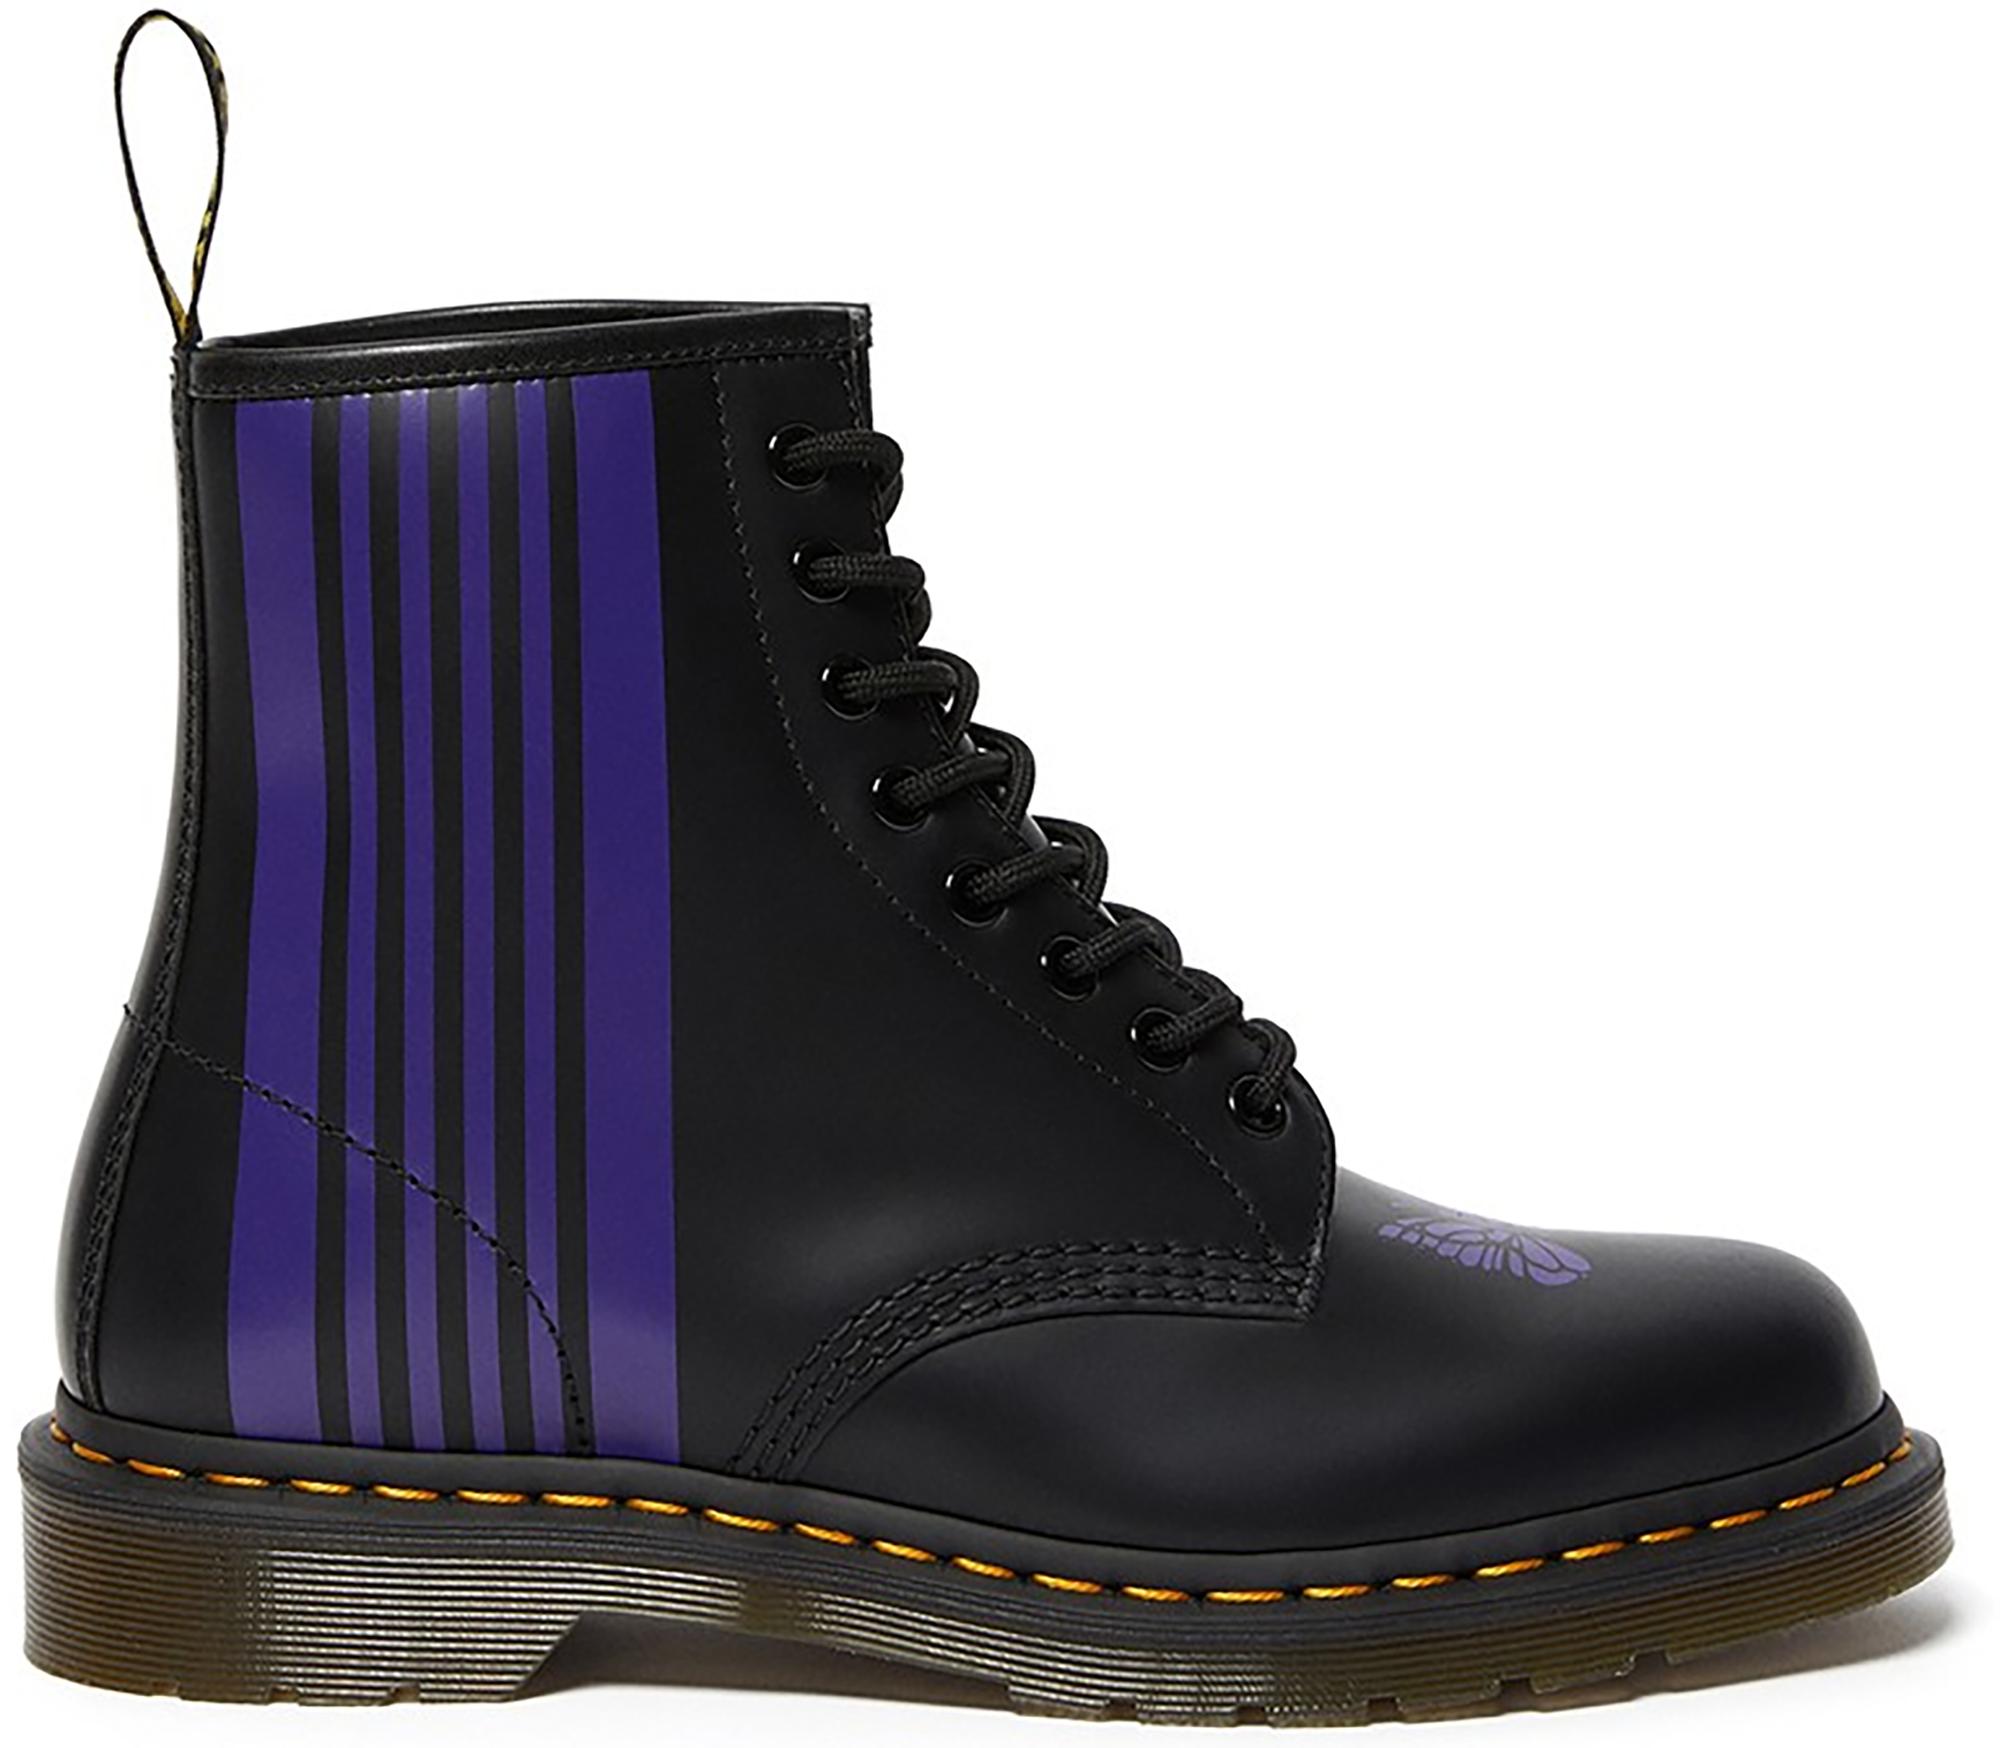 Dr. Martens 1460 Needles - Sneakers